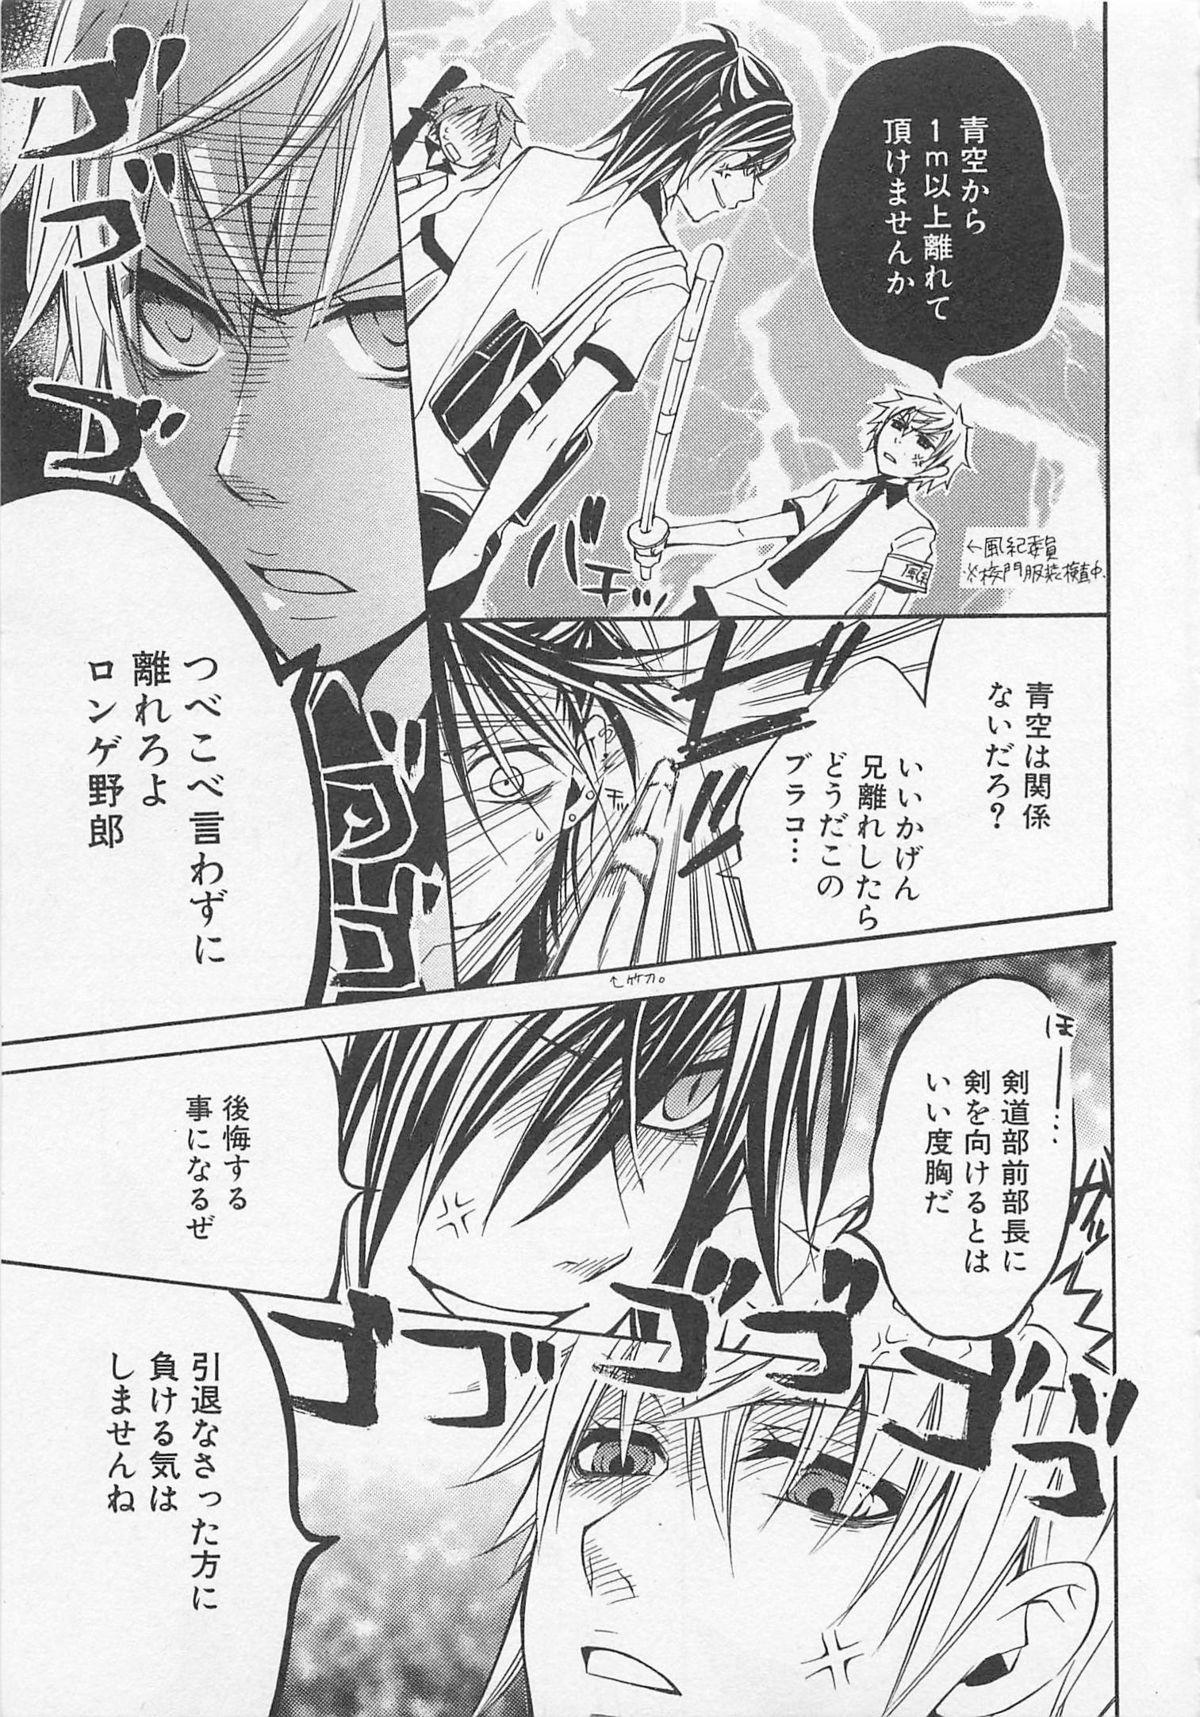 Shounentachi Vol. 2 17